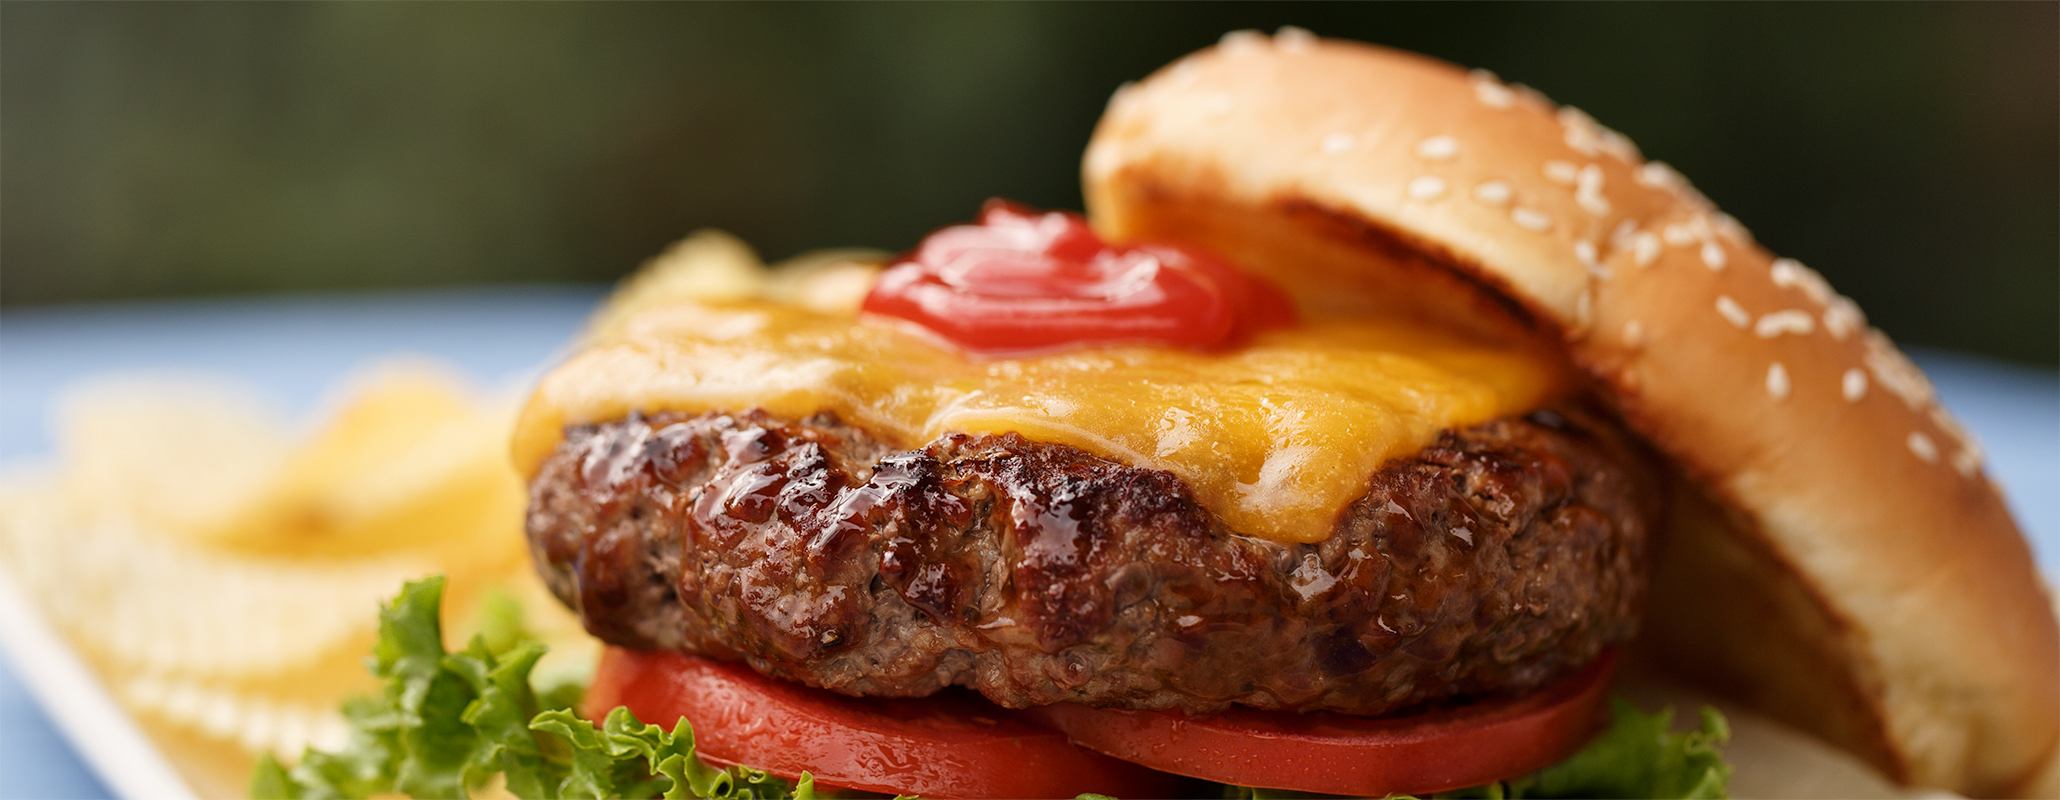 kfd-howtohamburger-header-Burgers_5_0391.jpg